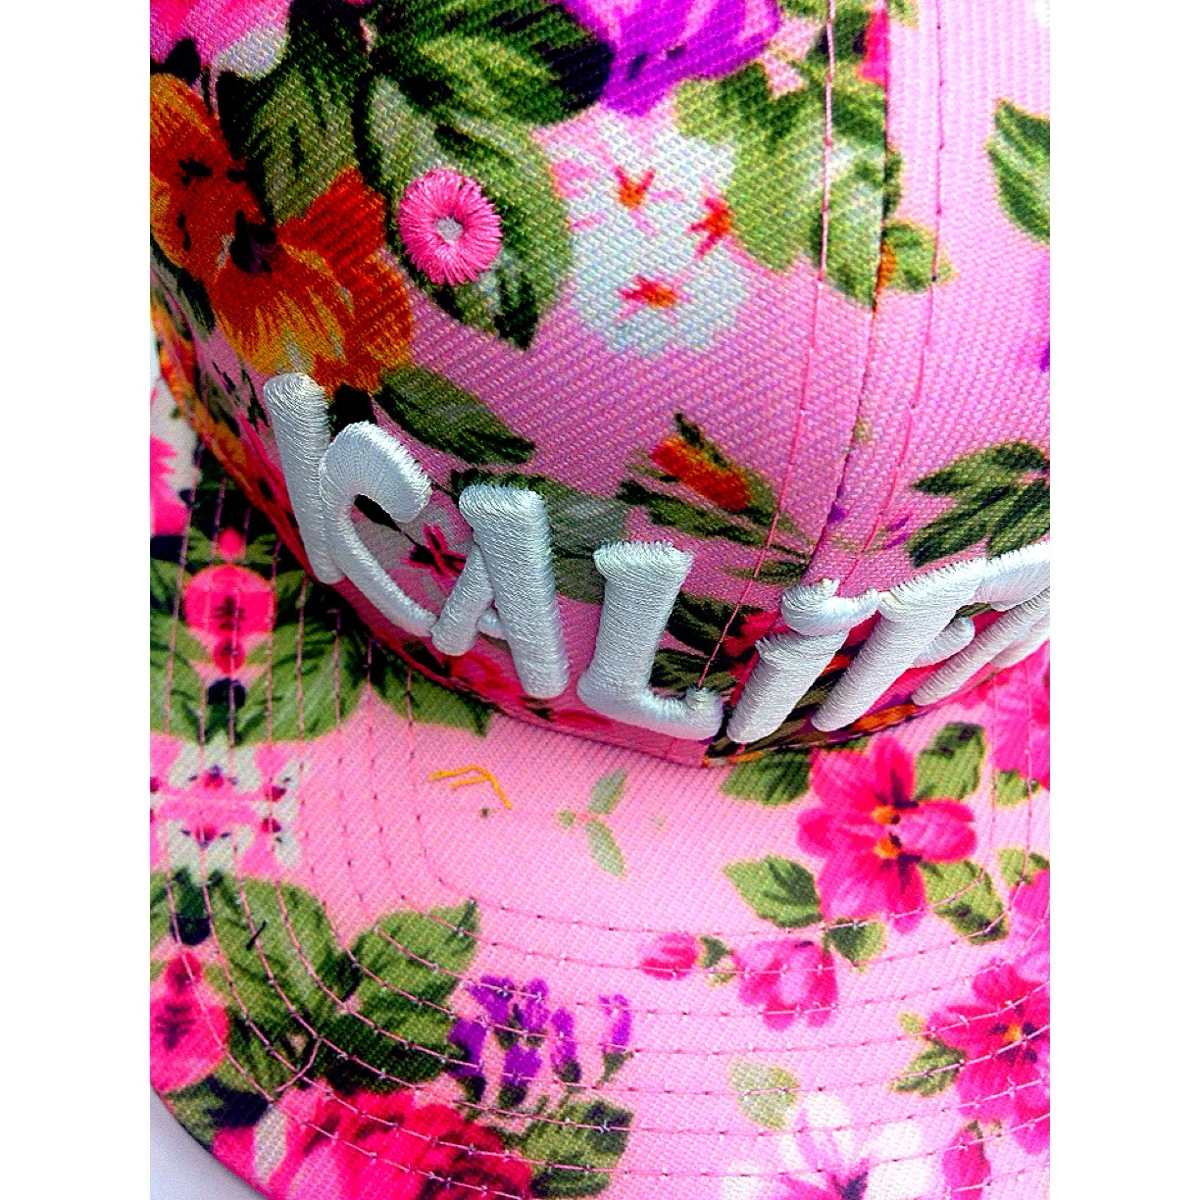 d51ee0f51af43 boné aba reta strapback florido floral flores kalifah rosas. Carregando zoom .